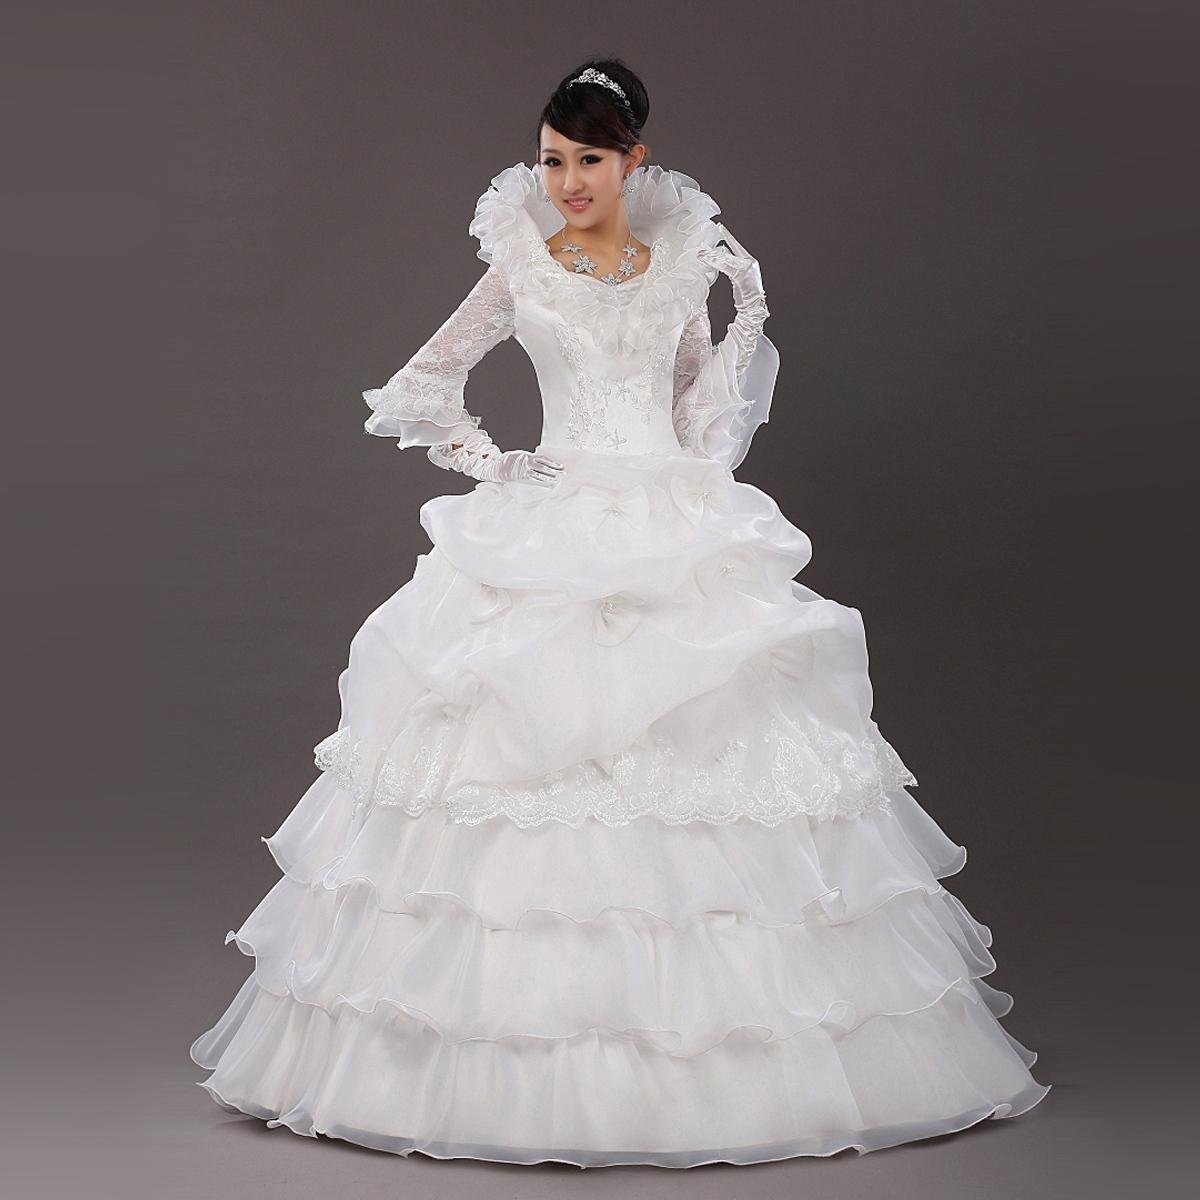 Turtleneck Wedding Gown: EMS FREE SHIPPING Fashion Wedding Dress Long-sleeve Lace